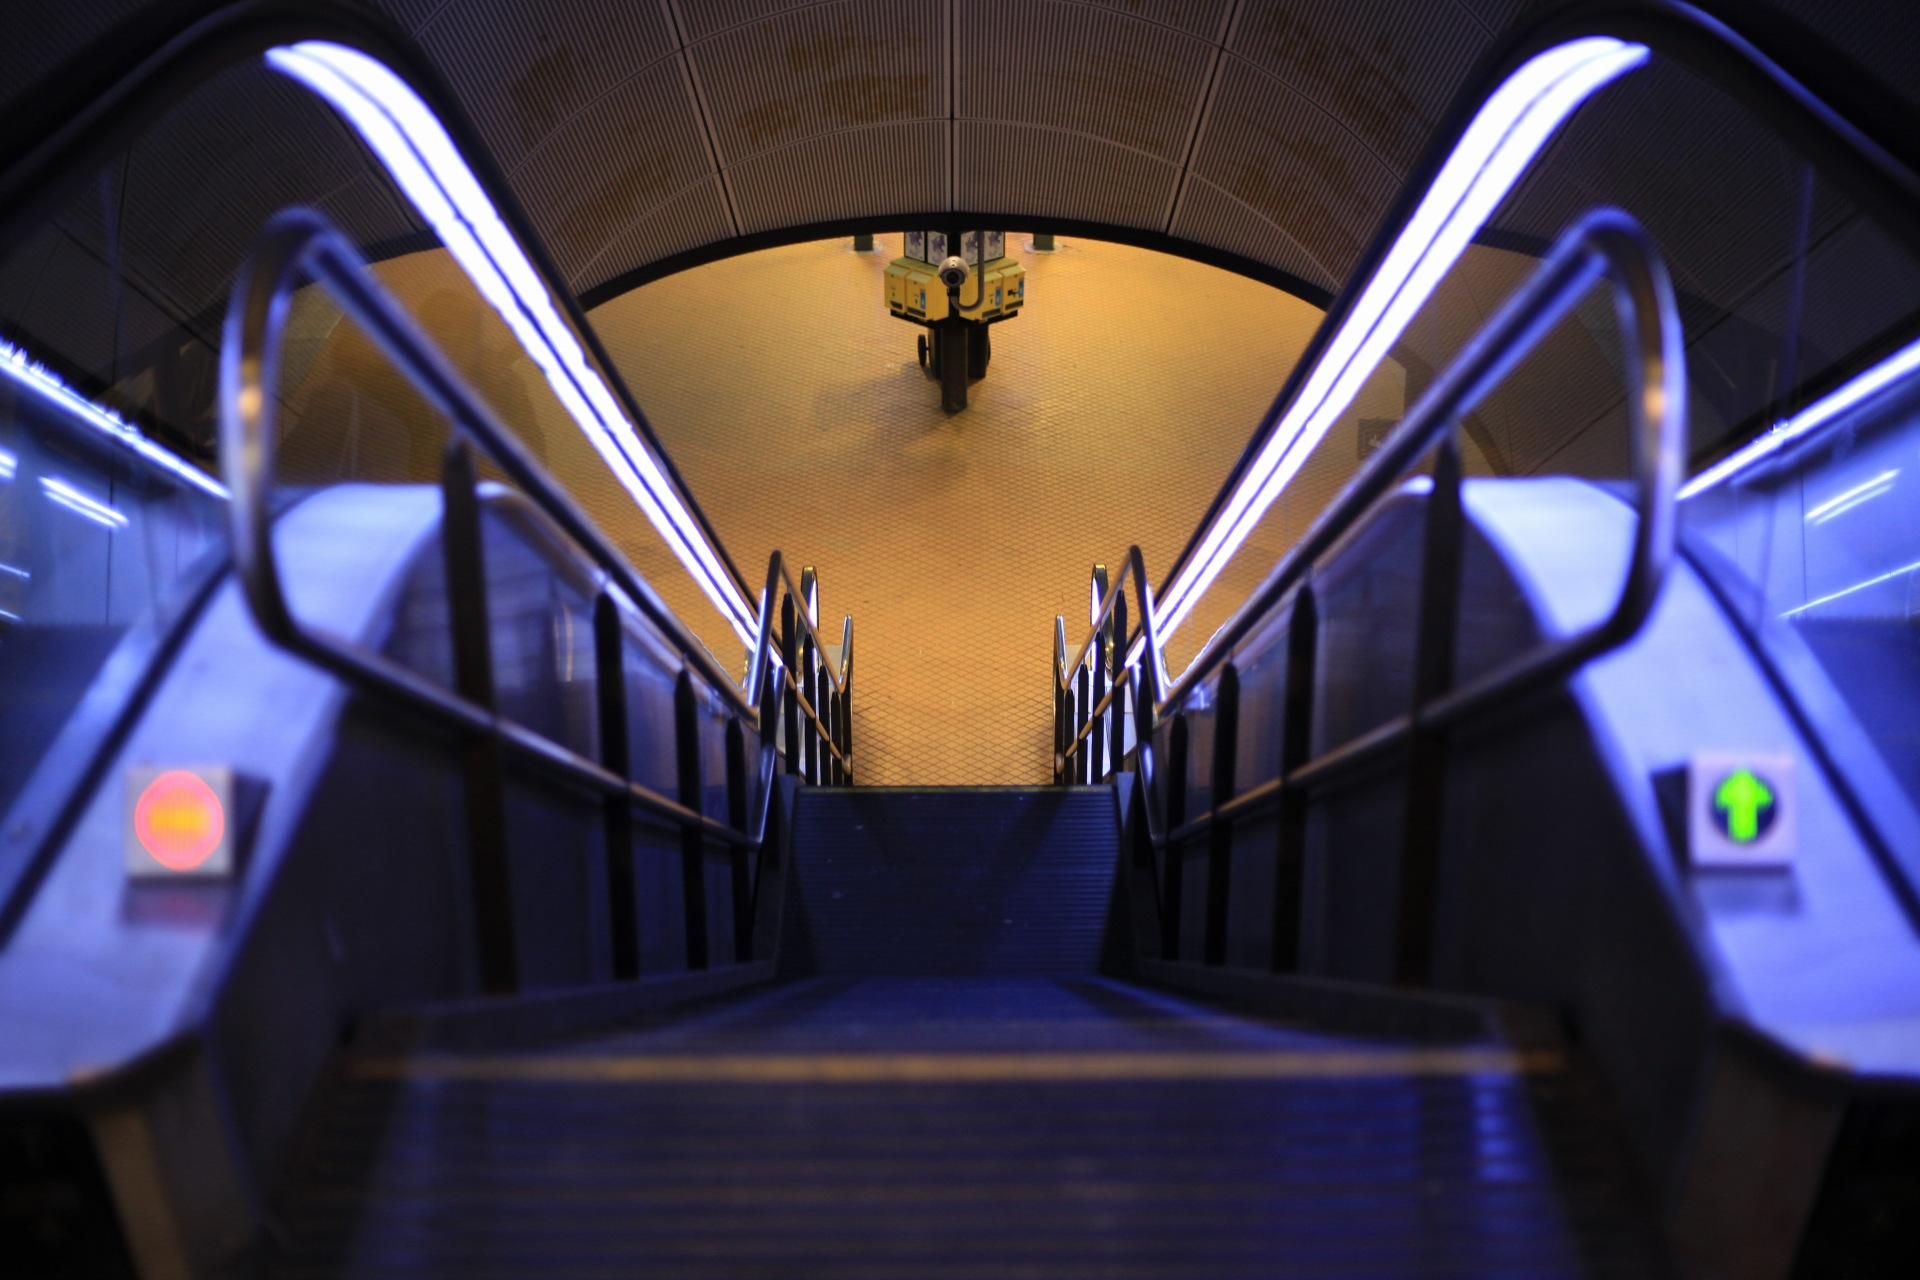 Steps and Escalator, Kopenhagen Central Station, Denmark